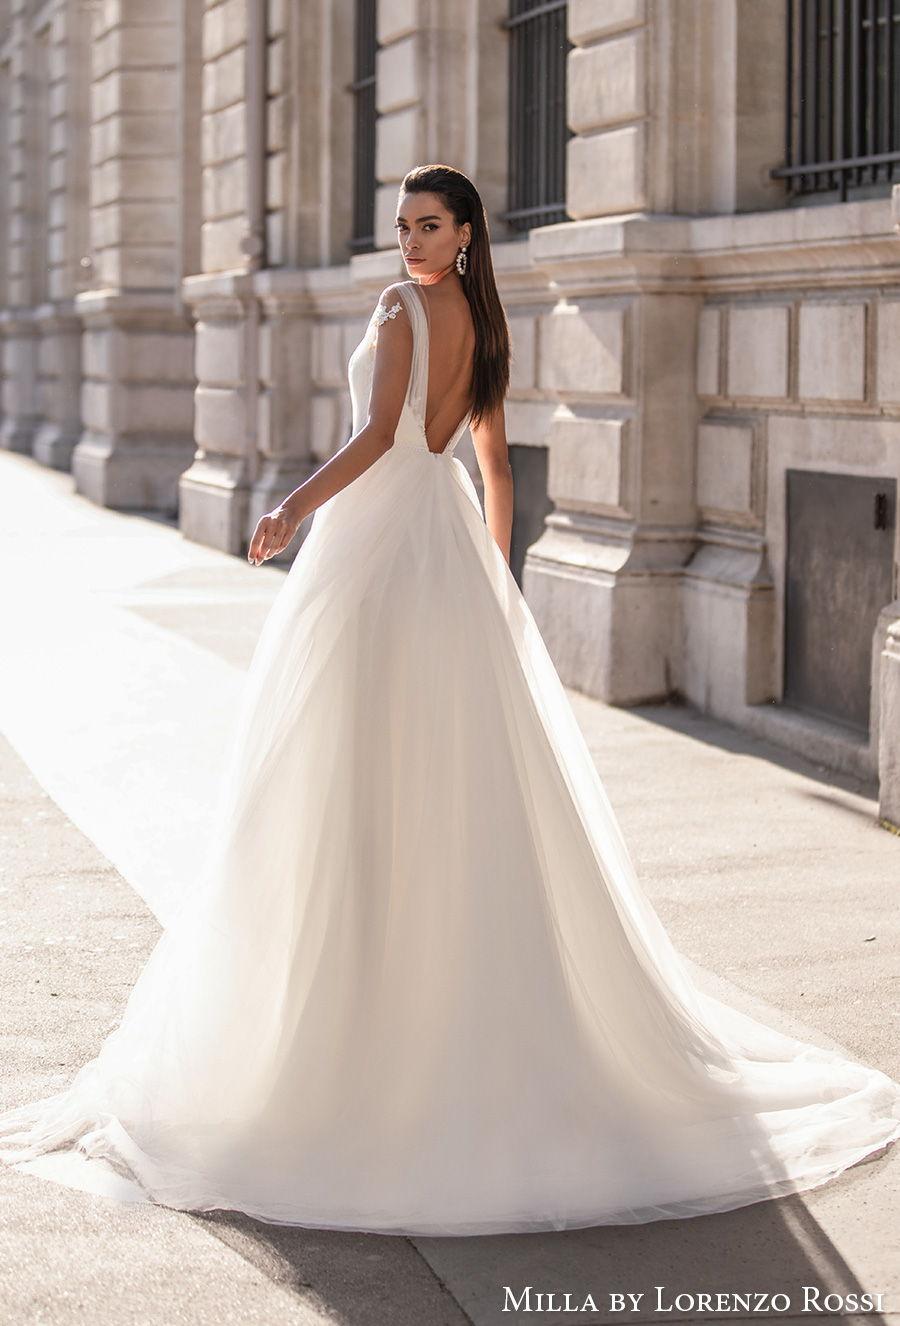 milla lorenzo rossi 2021 bridal cap sleeves  sweetheart neckline heavily embellished bodice romantic a  line wedding dress backless low v back chapel train (annebelle) bv